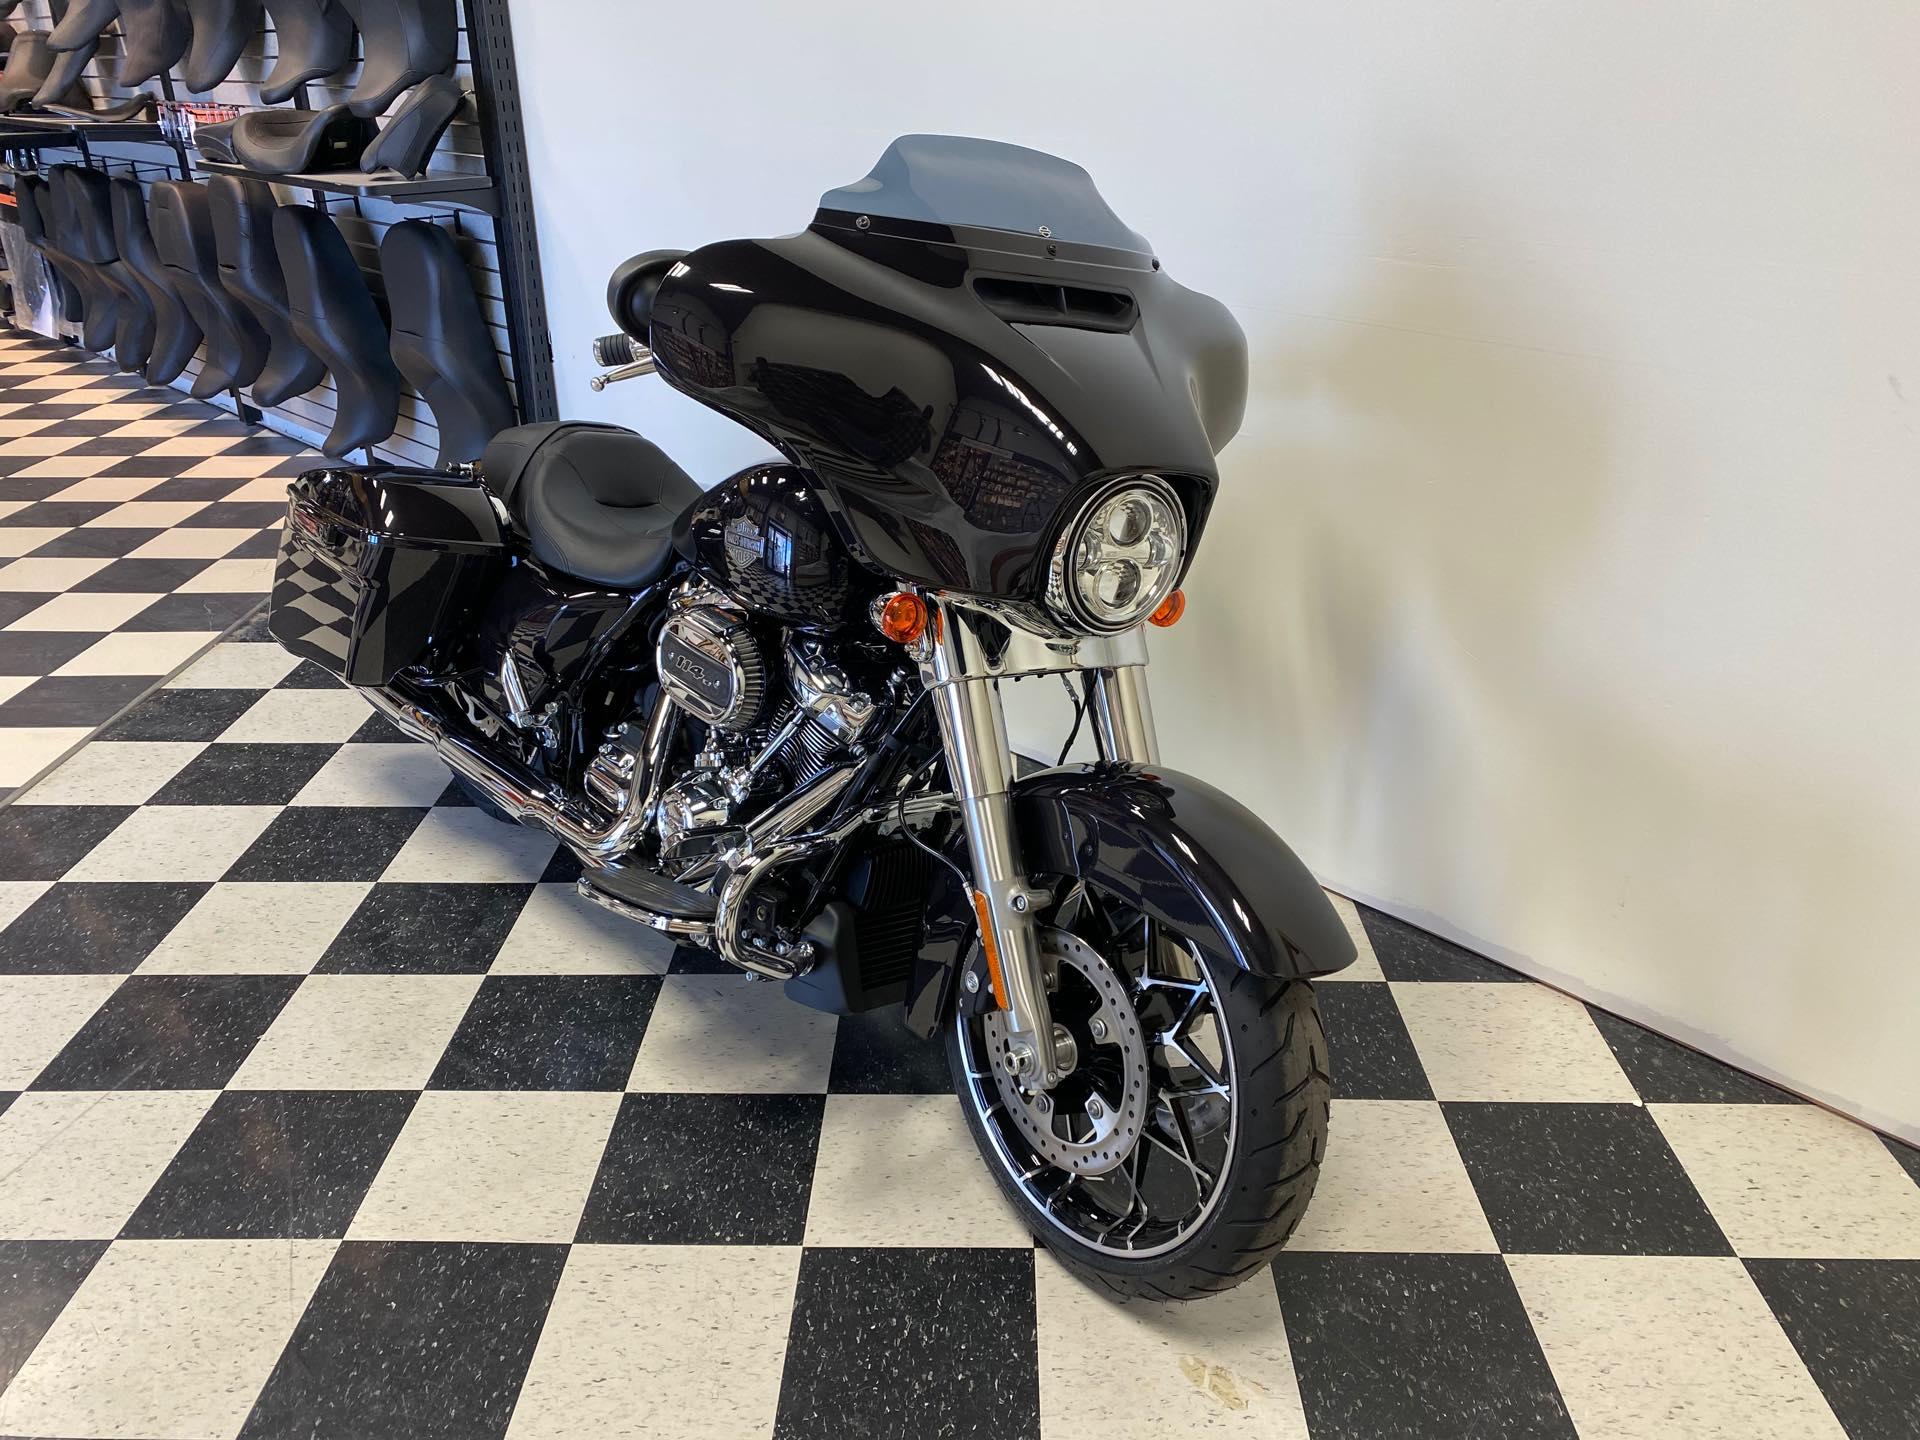 2021 Harley-Davidson Touring FLHXS Street Glide Special at Deluxe Harley Davidson